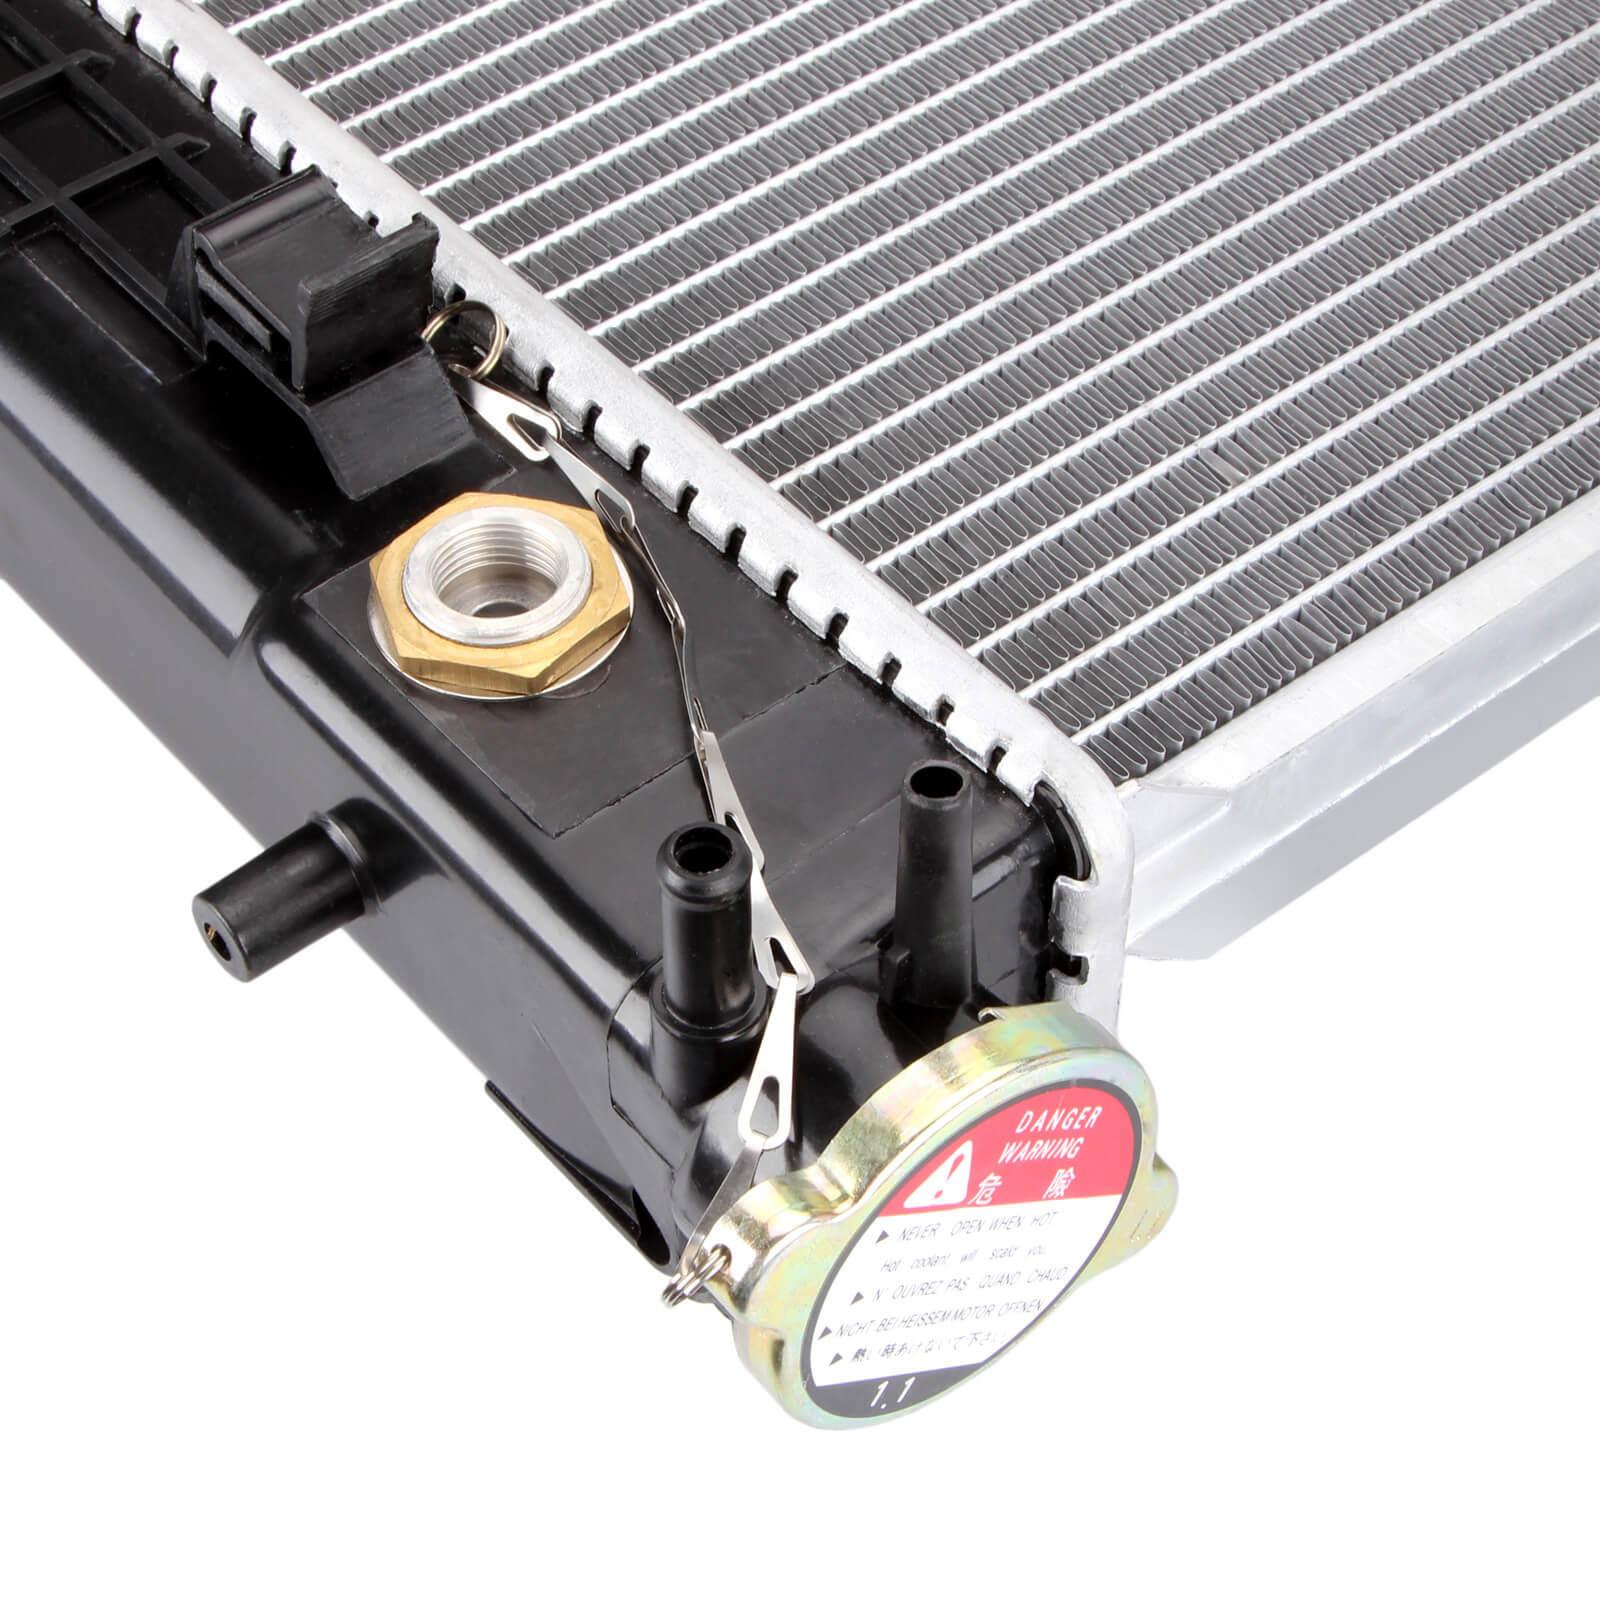 Dromedary Brand statesman radiatorforholdencommodoreve3036v620062012automanualhighquality 20062013 holden radiator